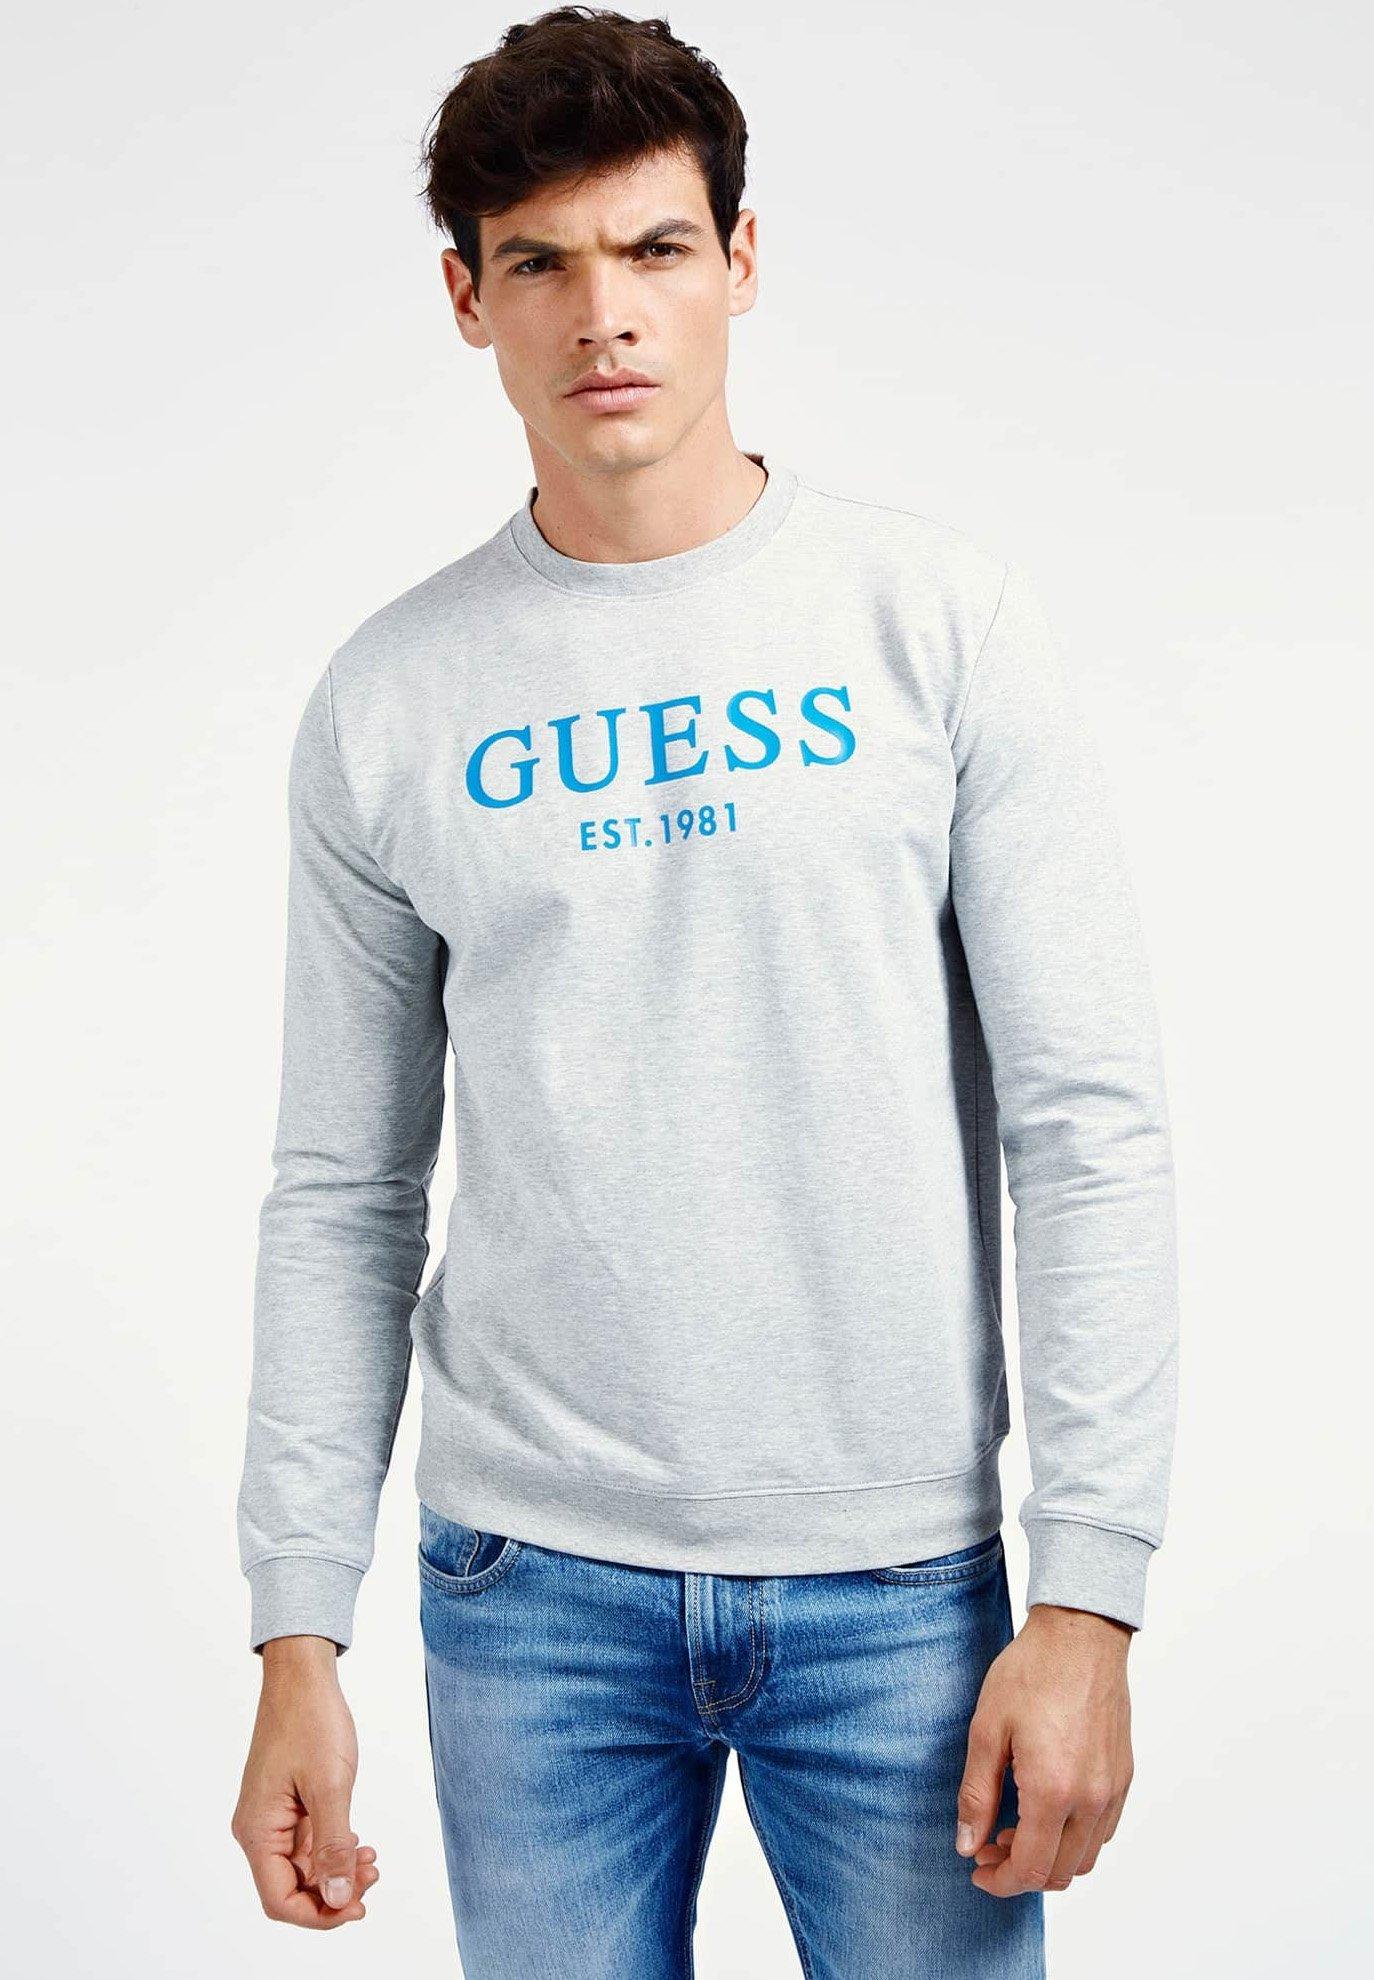 Guess Sweatshirt hellgrau Zalando.at